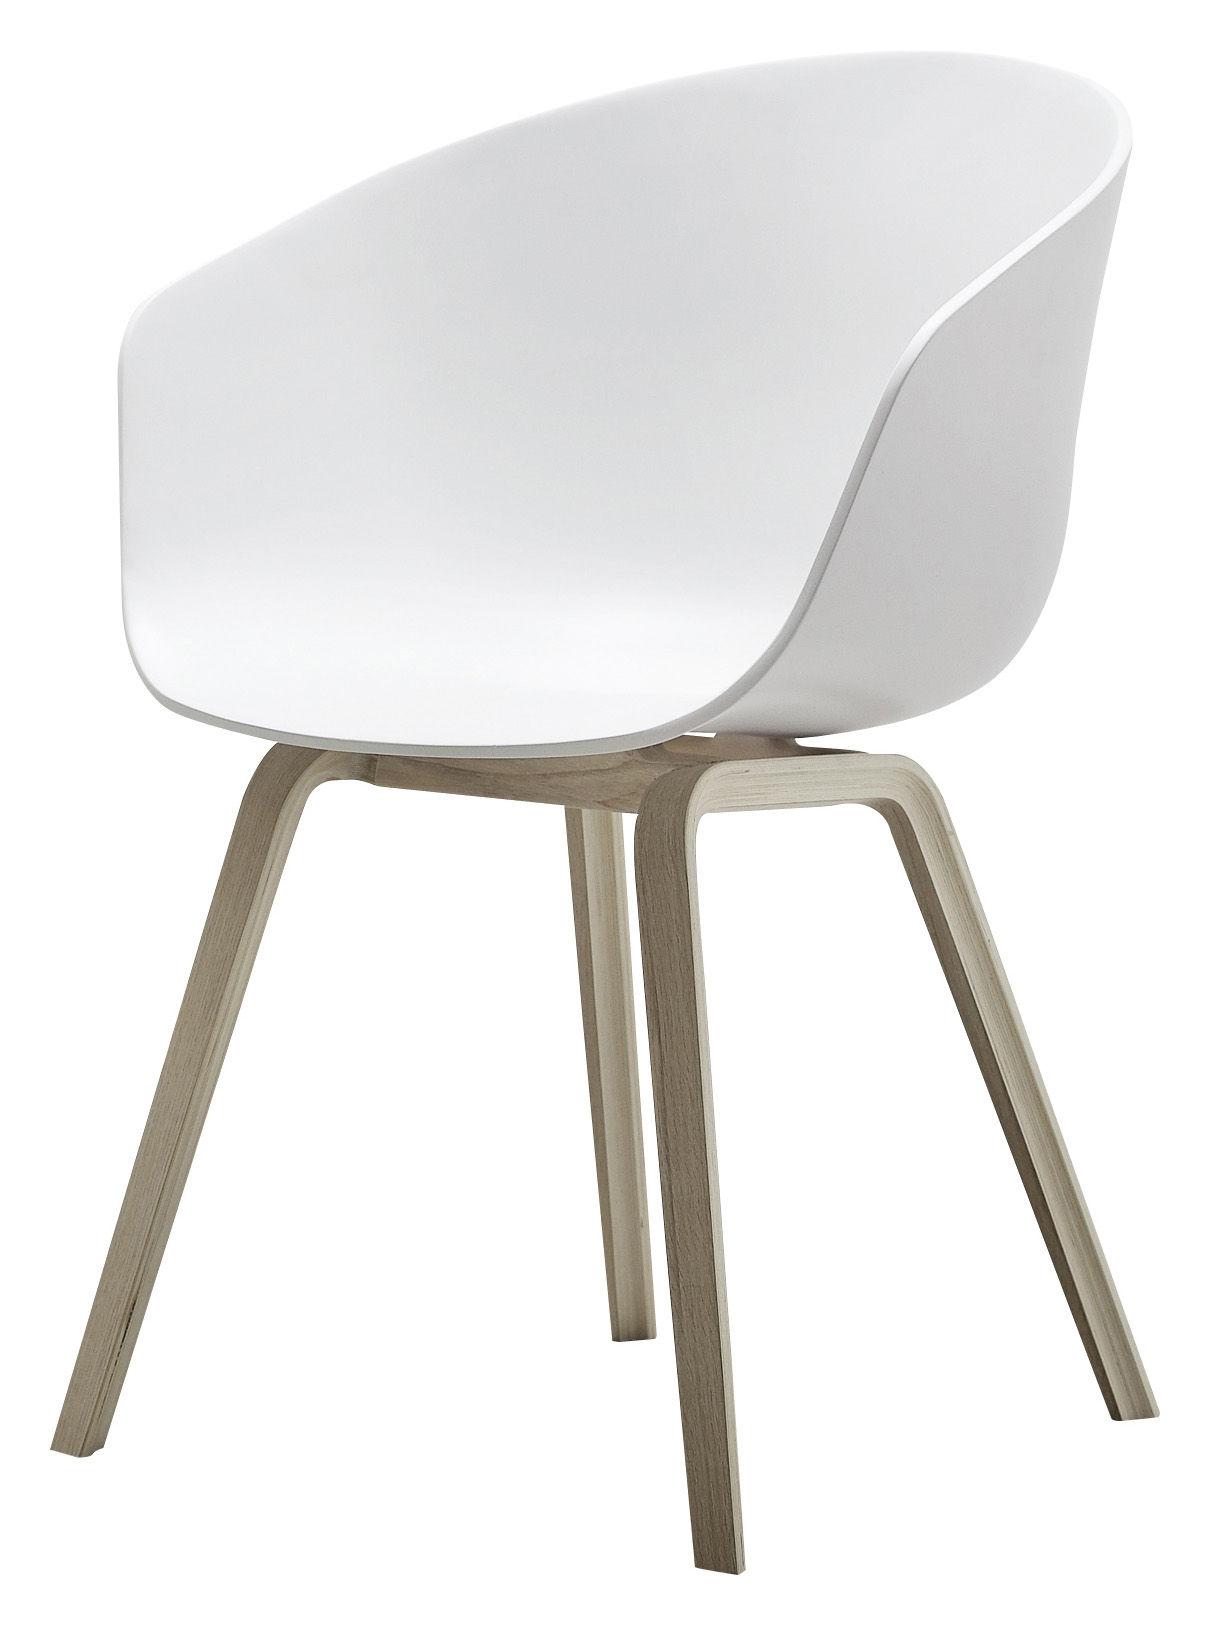 Möbel - Stühle  - About a chair AAC 22 Sessel - 4 Füße - Hay - Weiß - Gestell Holz natur - Chêne savonné, Polypropylen